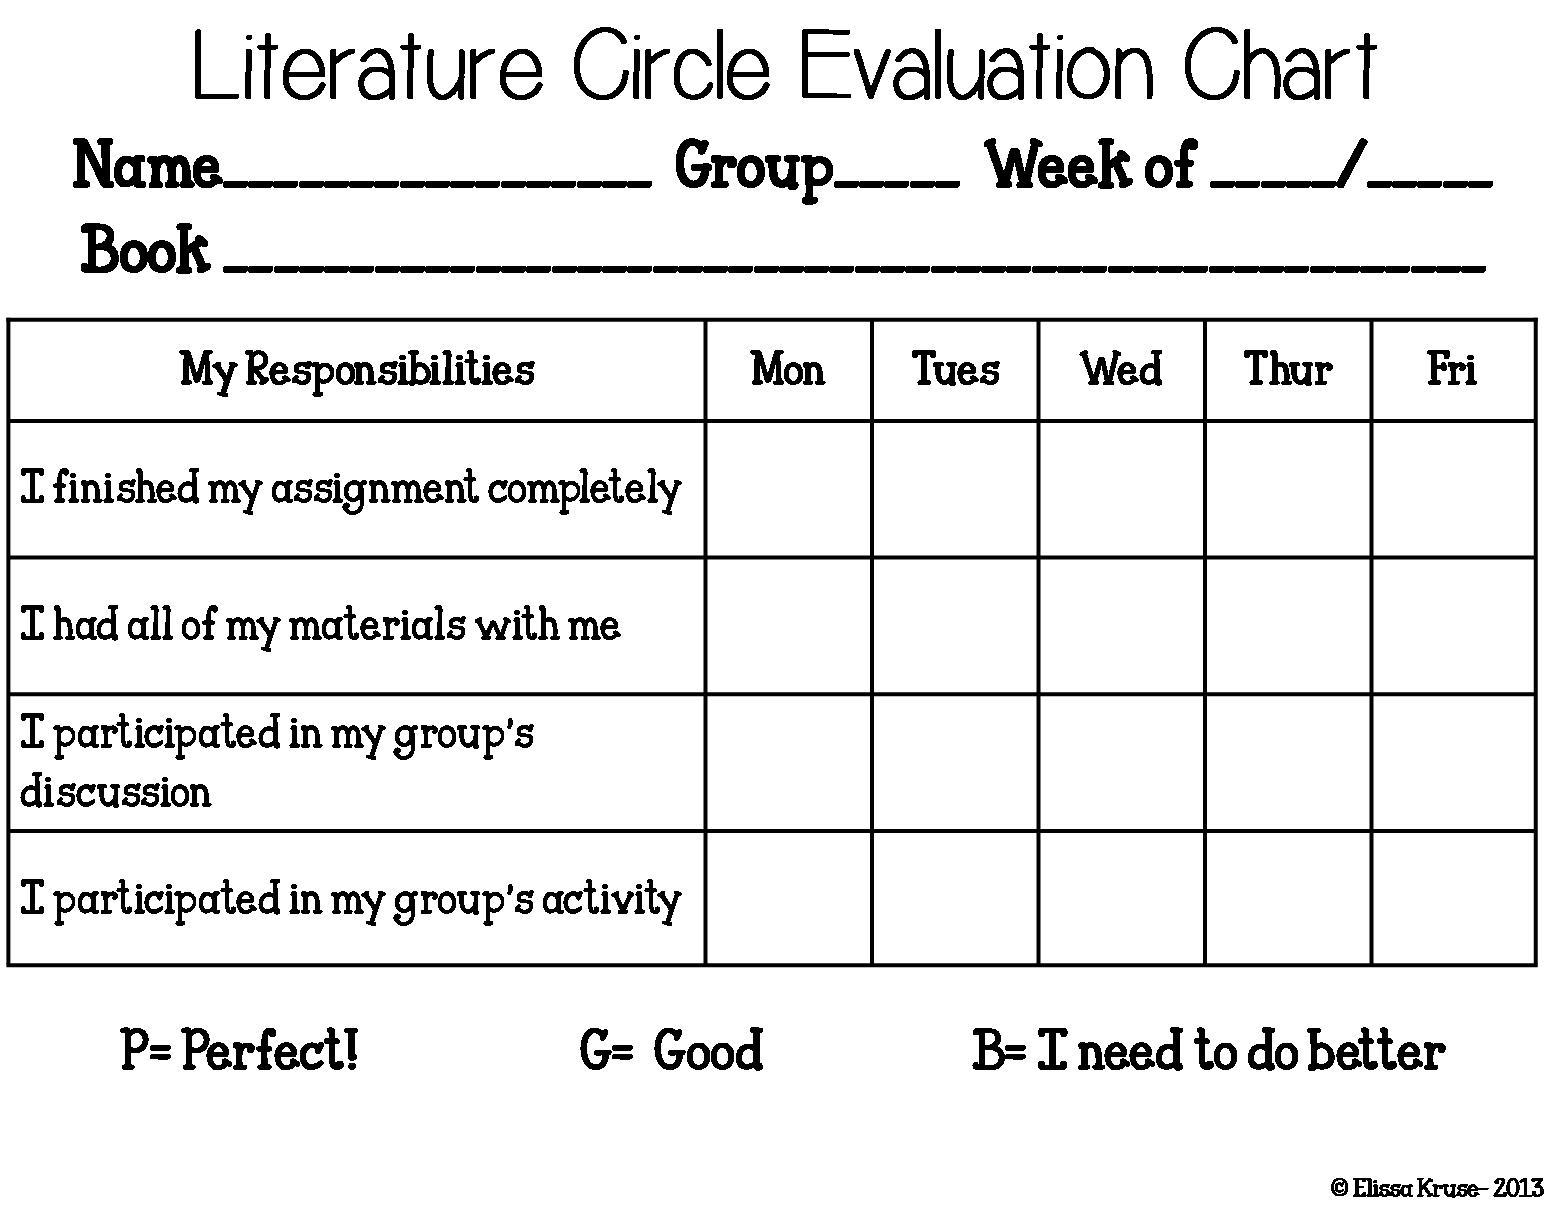 Workbooks literature circles roles worksheets : Literature Circles Forms Pictures to Pin on Pinterest - Clanek